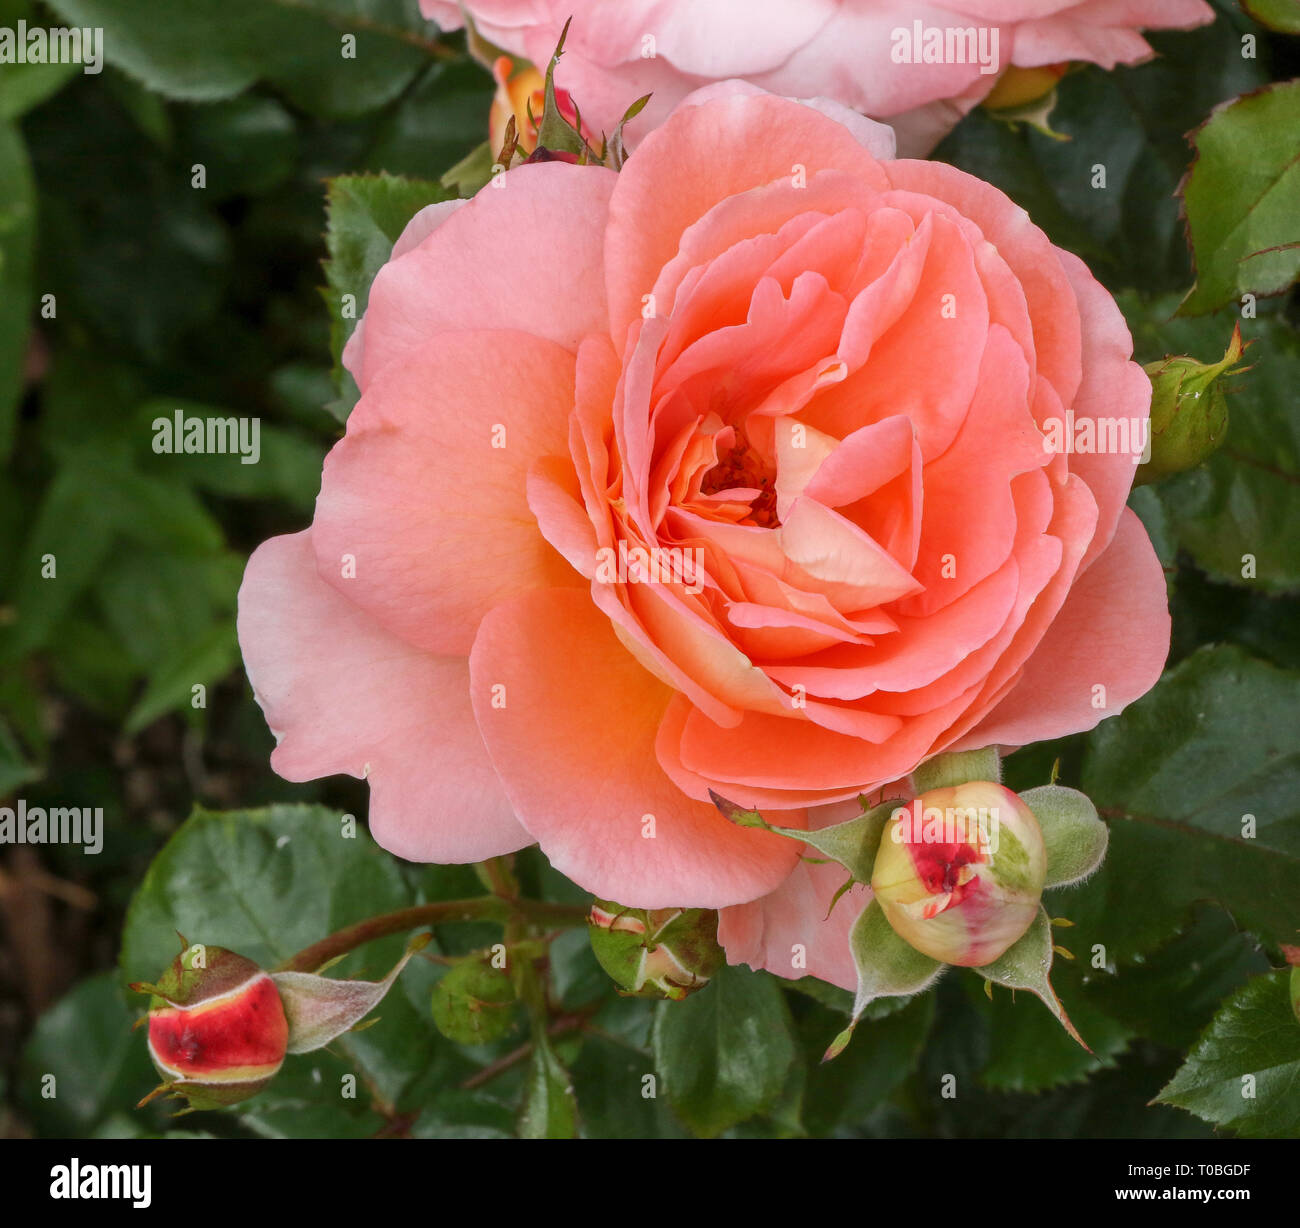 'Bonita', una naranja rosa rosa de color albaricoque en flor en 2018 Imagen De Stock